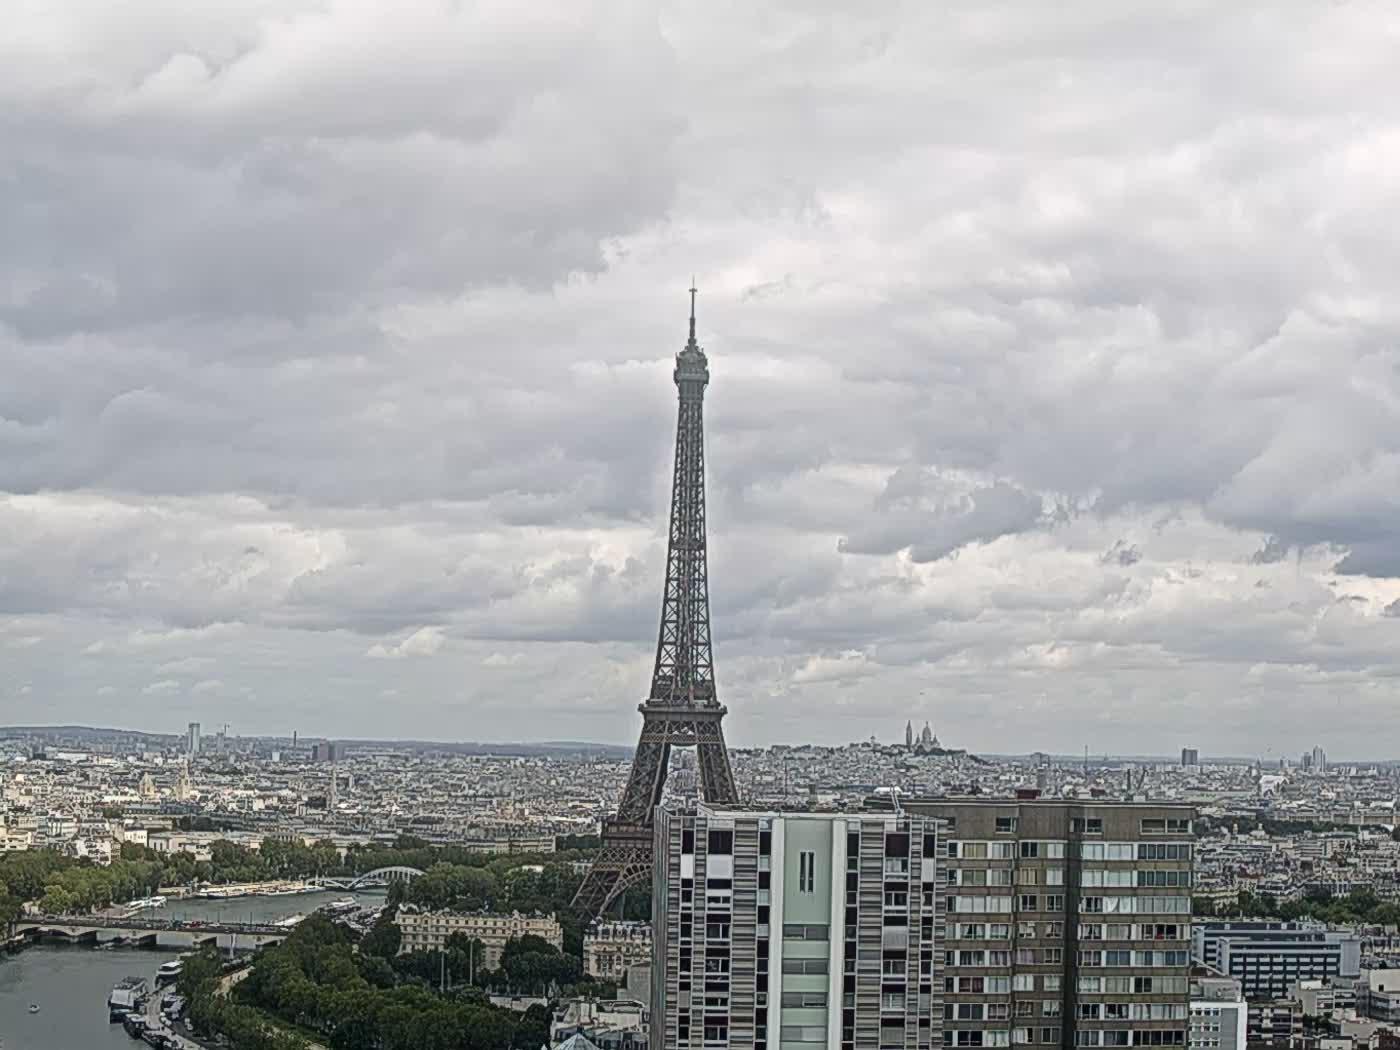 Paris Thu. 14:22